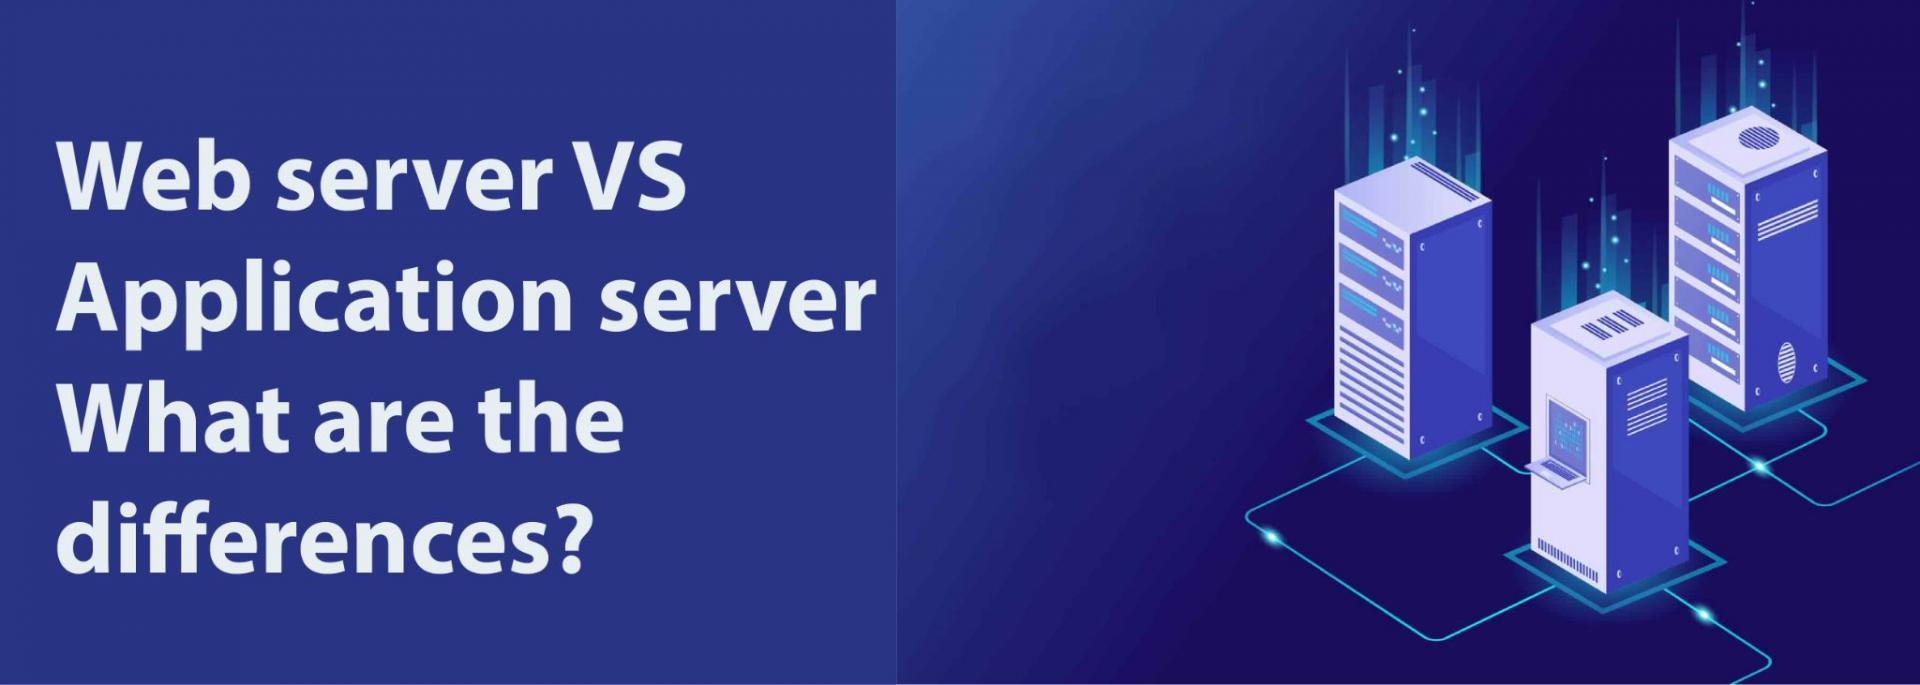 Web server VS Application server